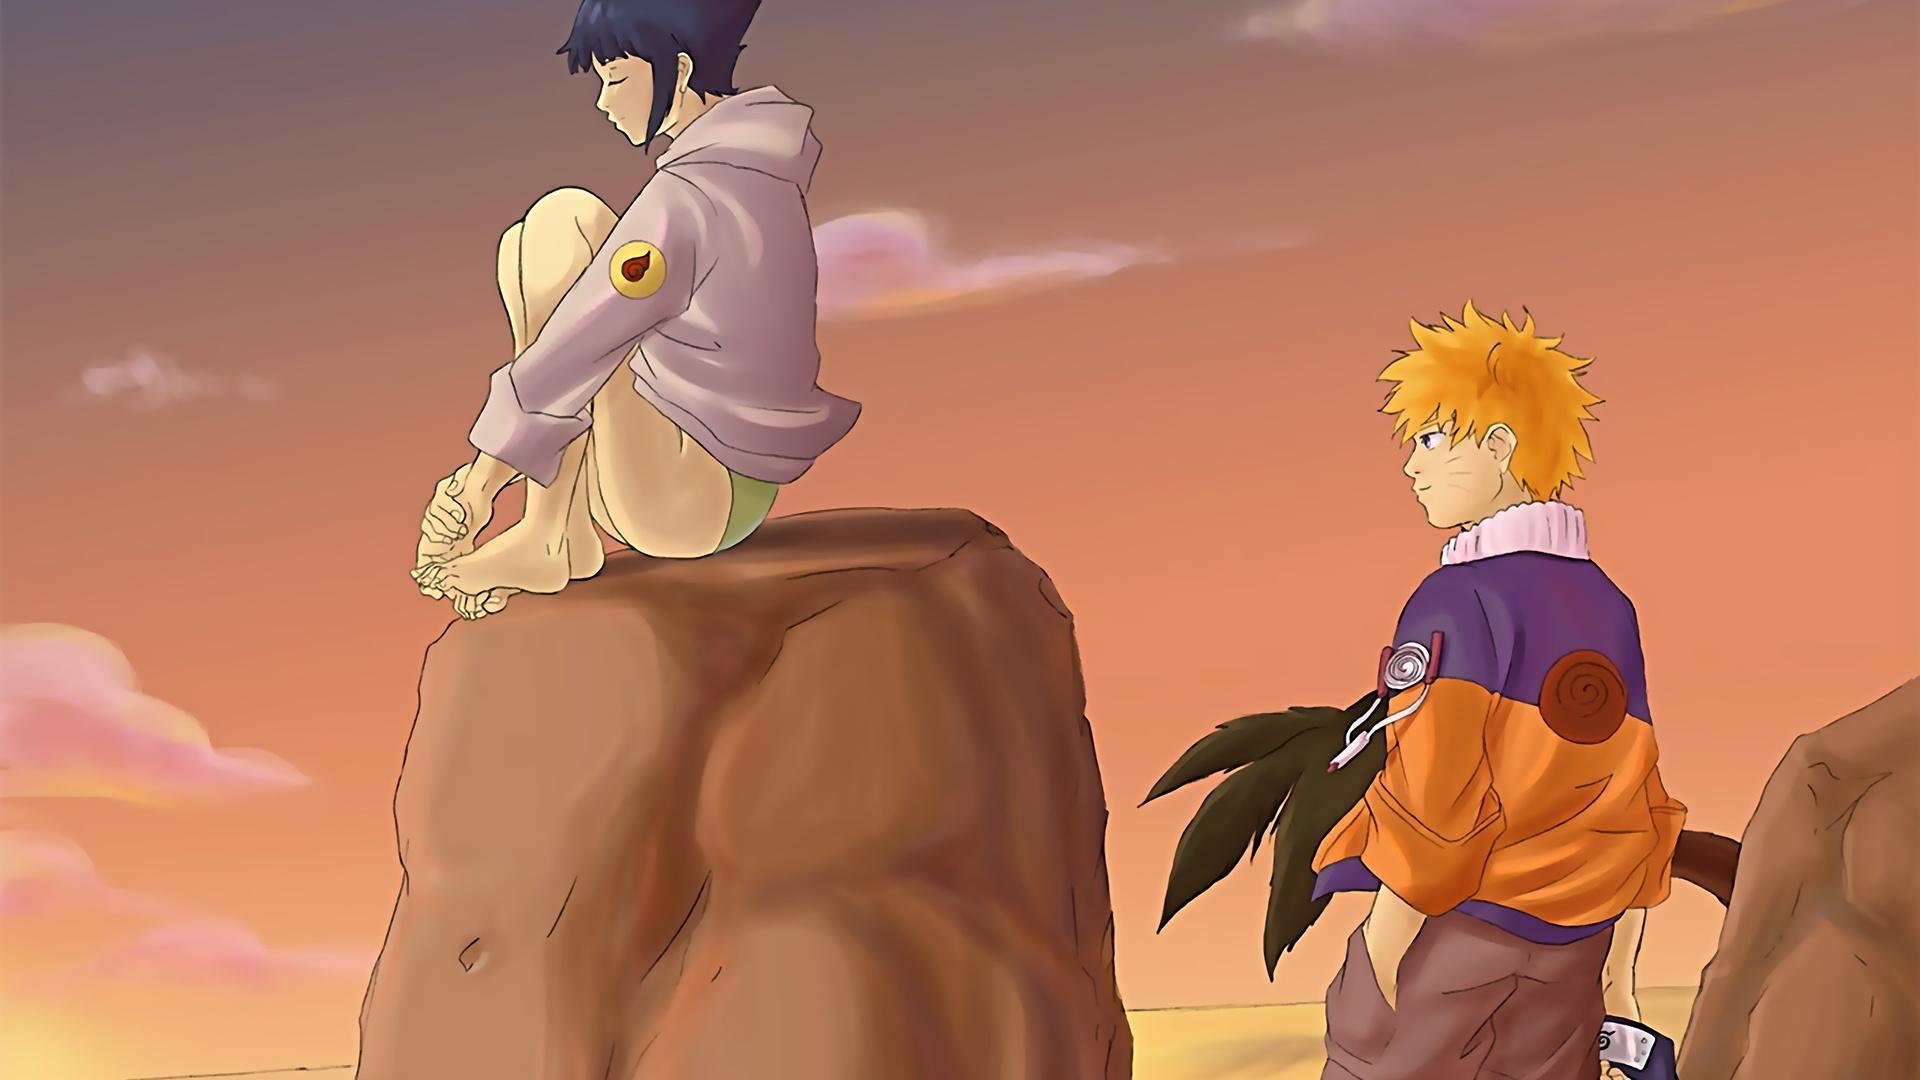 Wallpaper Illustration Anime Cartoon Boy Girl Naruto